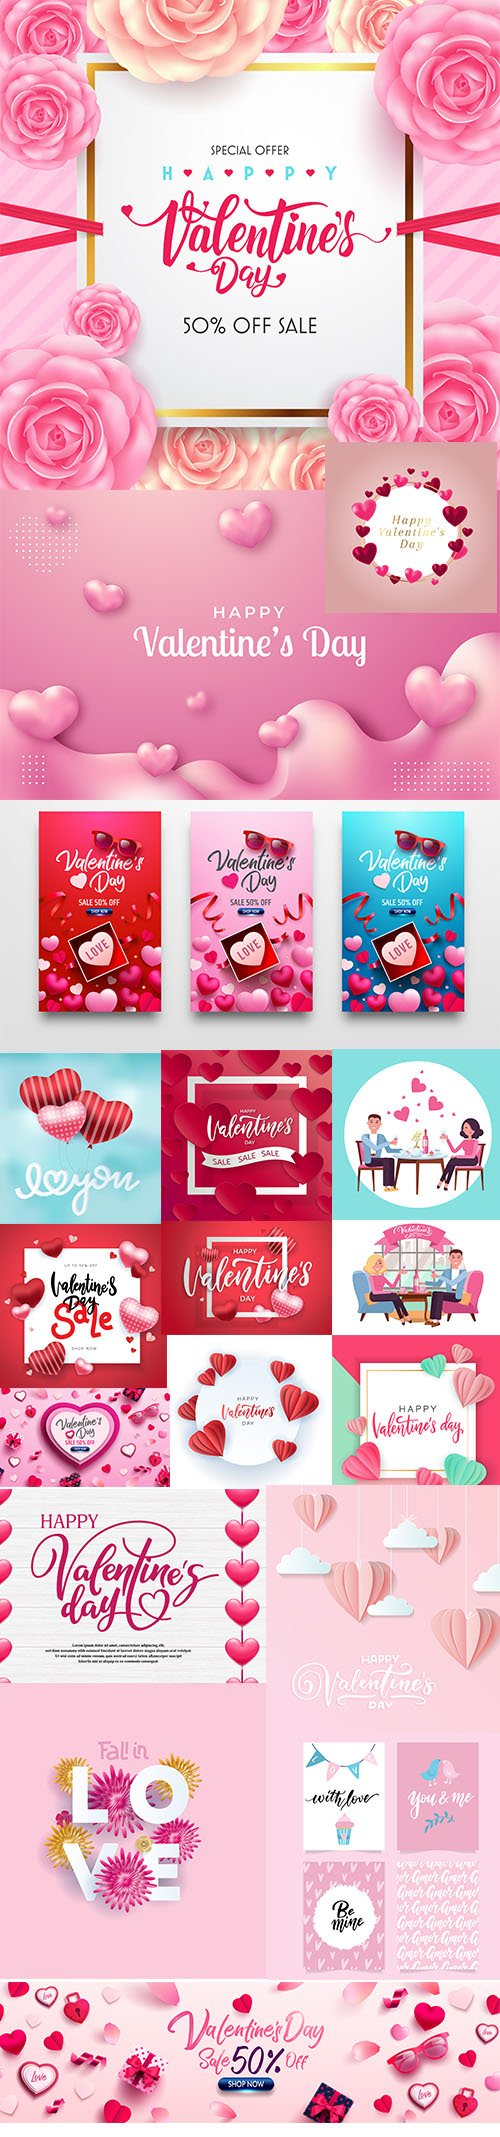 Set of Romantic Valentines Day Illustrations Vol 6